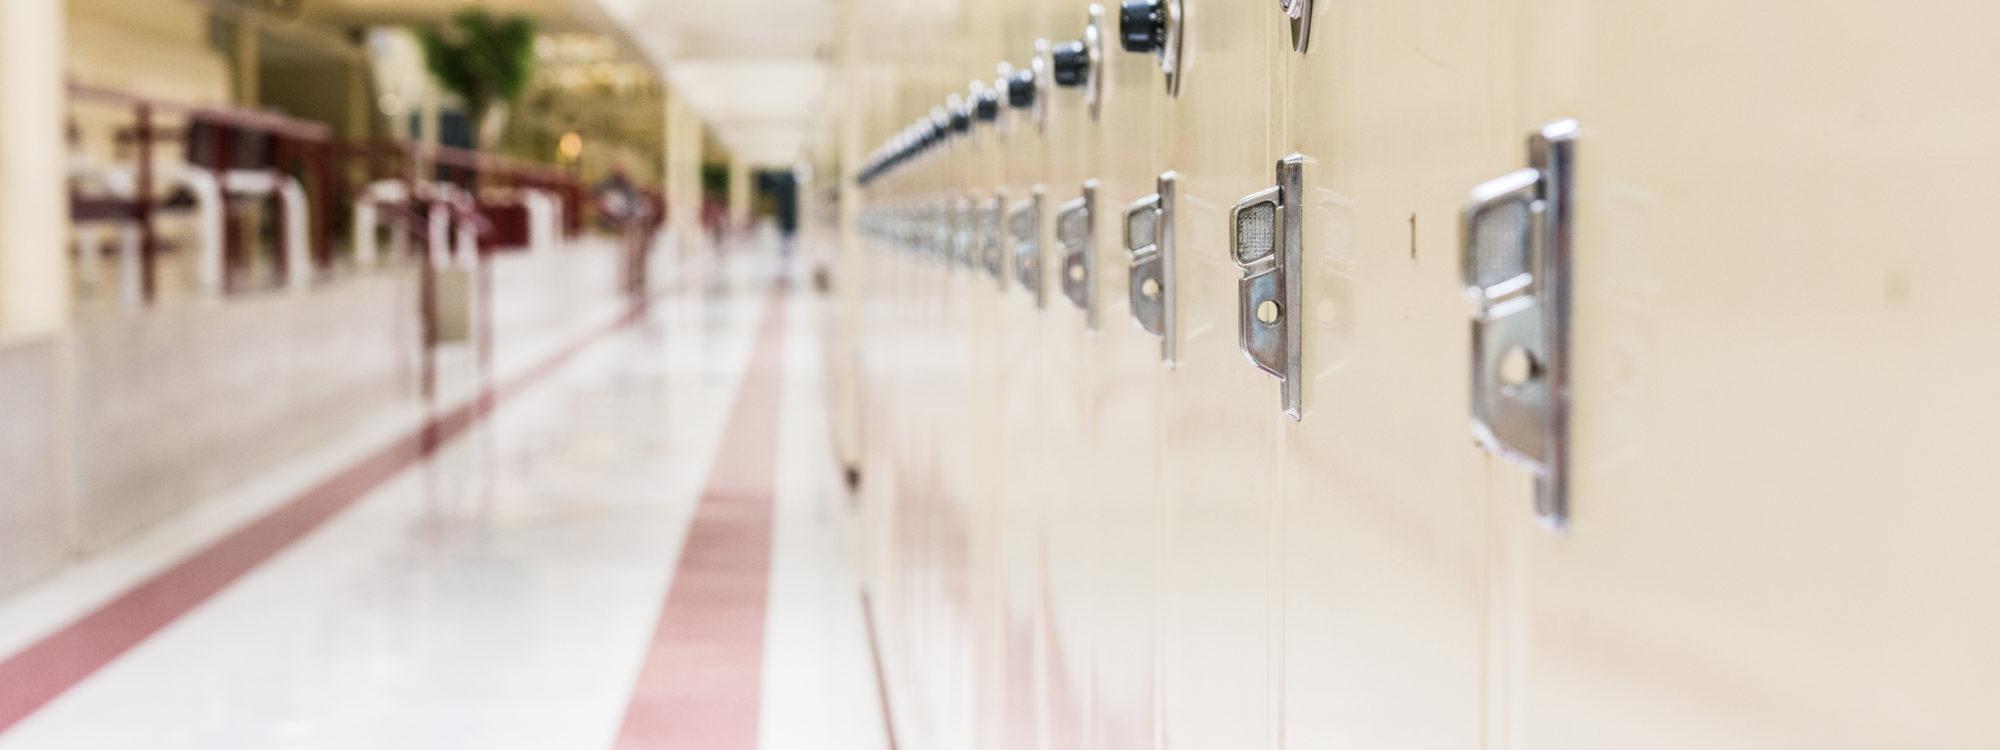 School hallway with rows of lockers